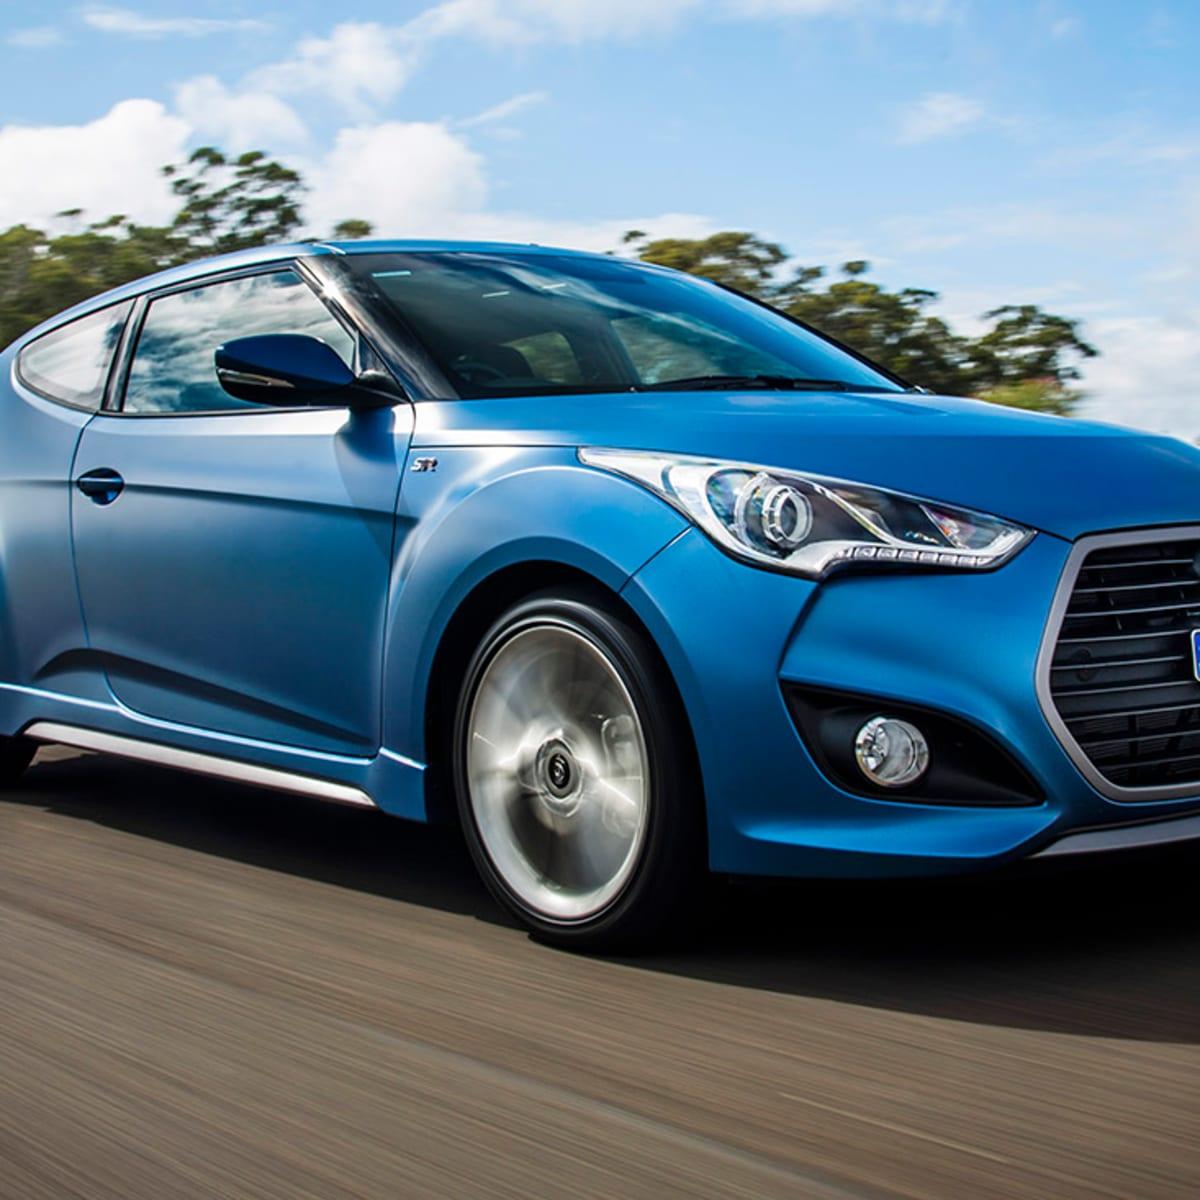 2016 Hyundai Veloster update: higher entry price, Apple CarPlay